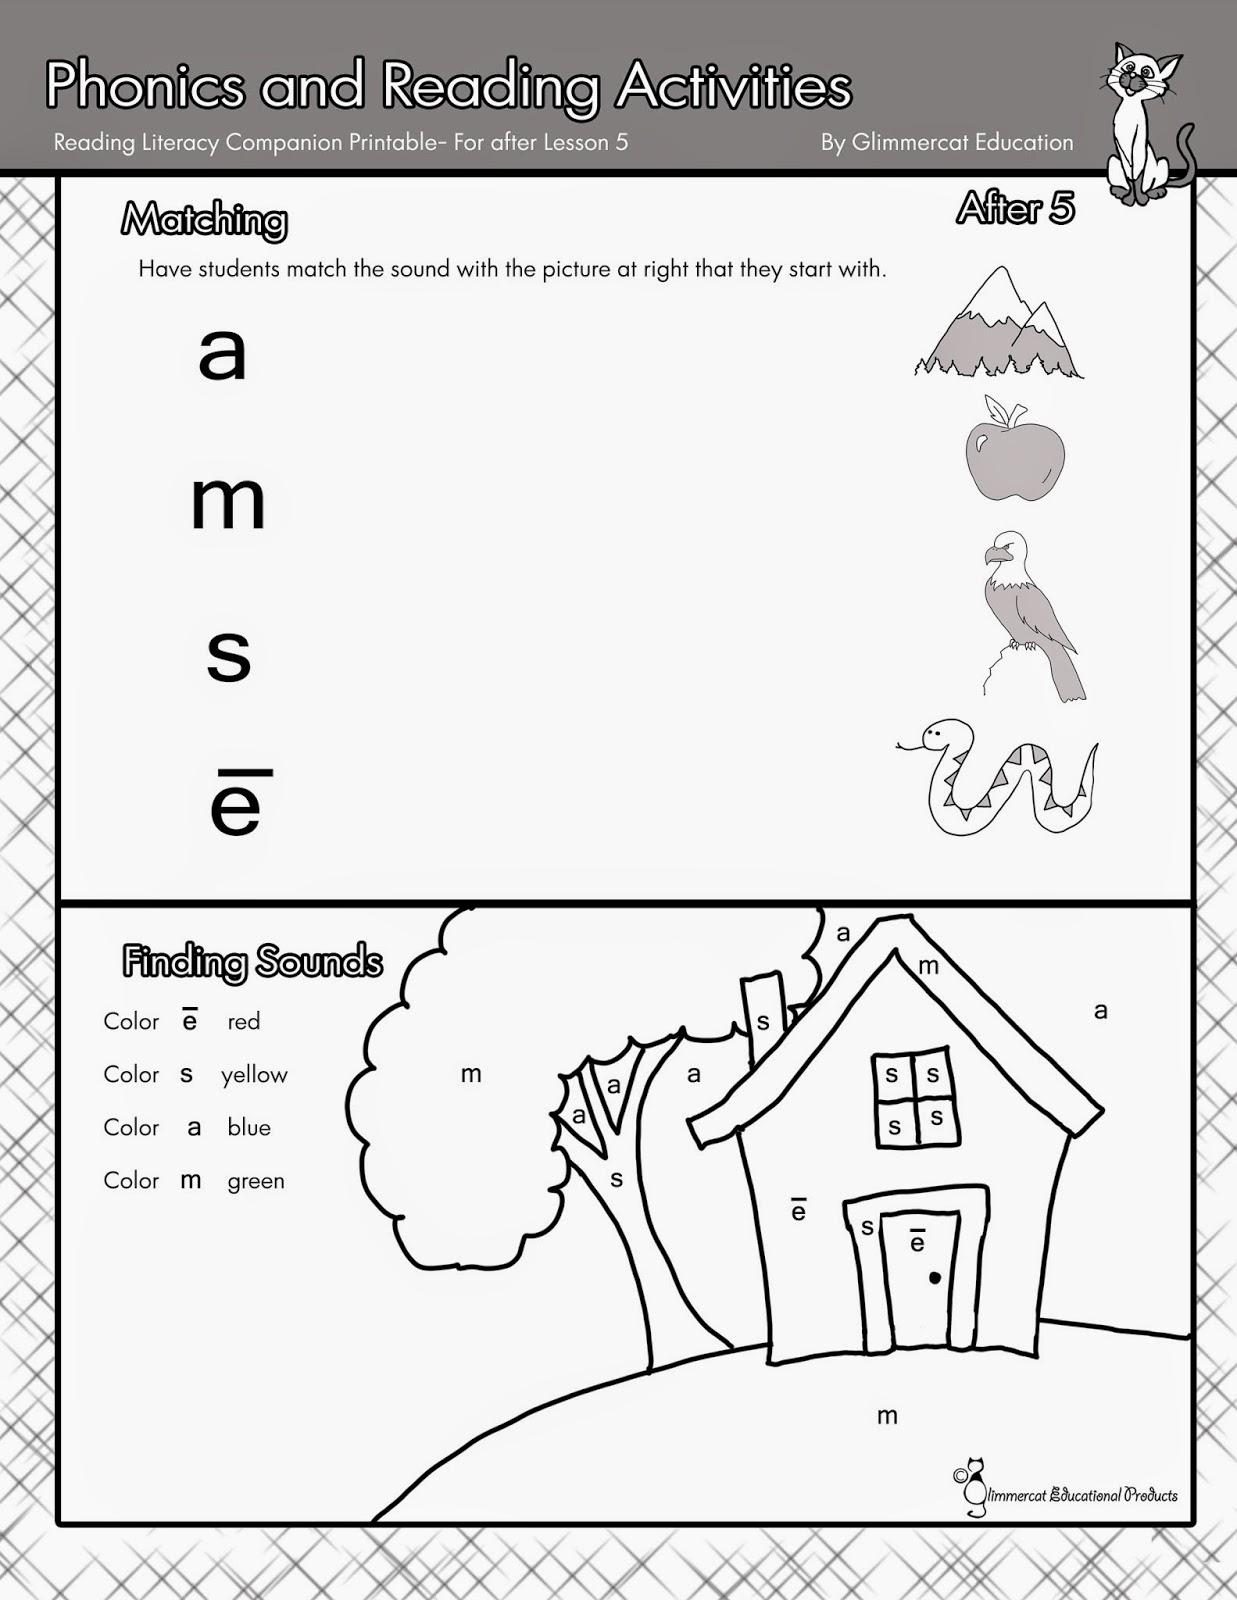 Glimmercat Education The Best Reading Program Ever